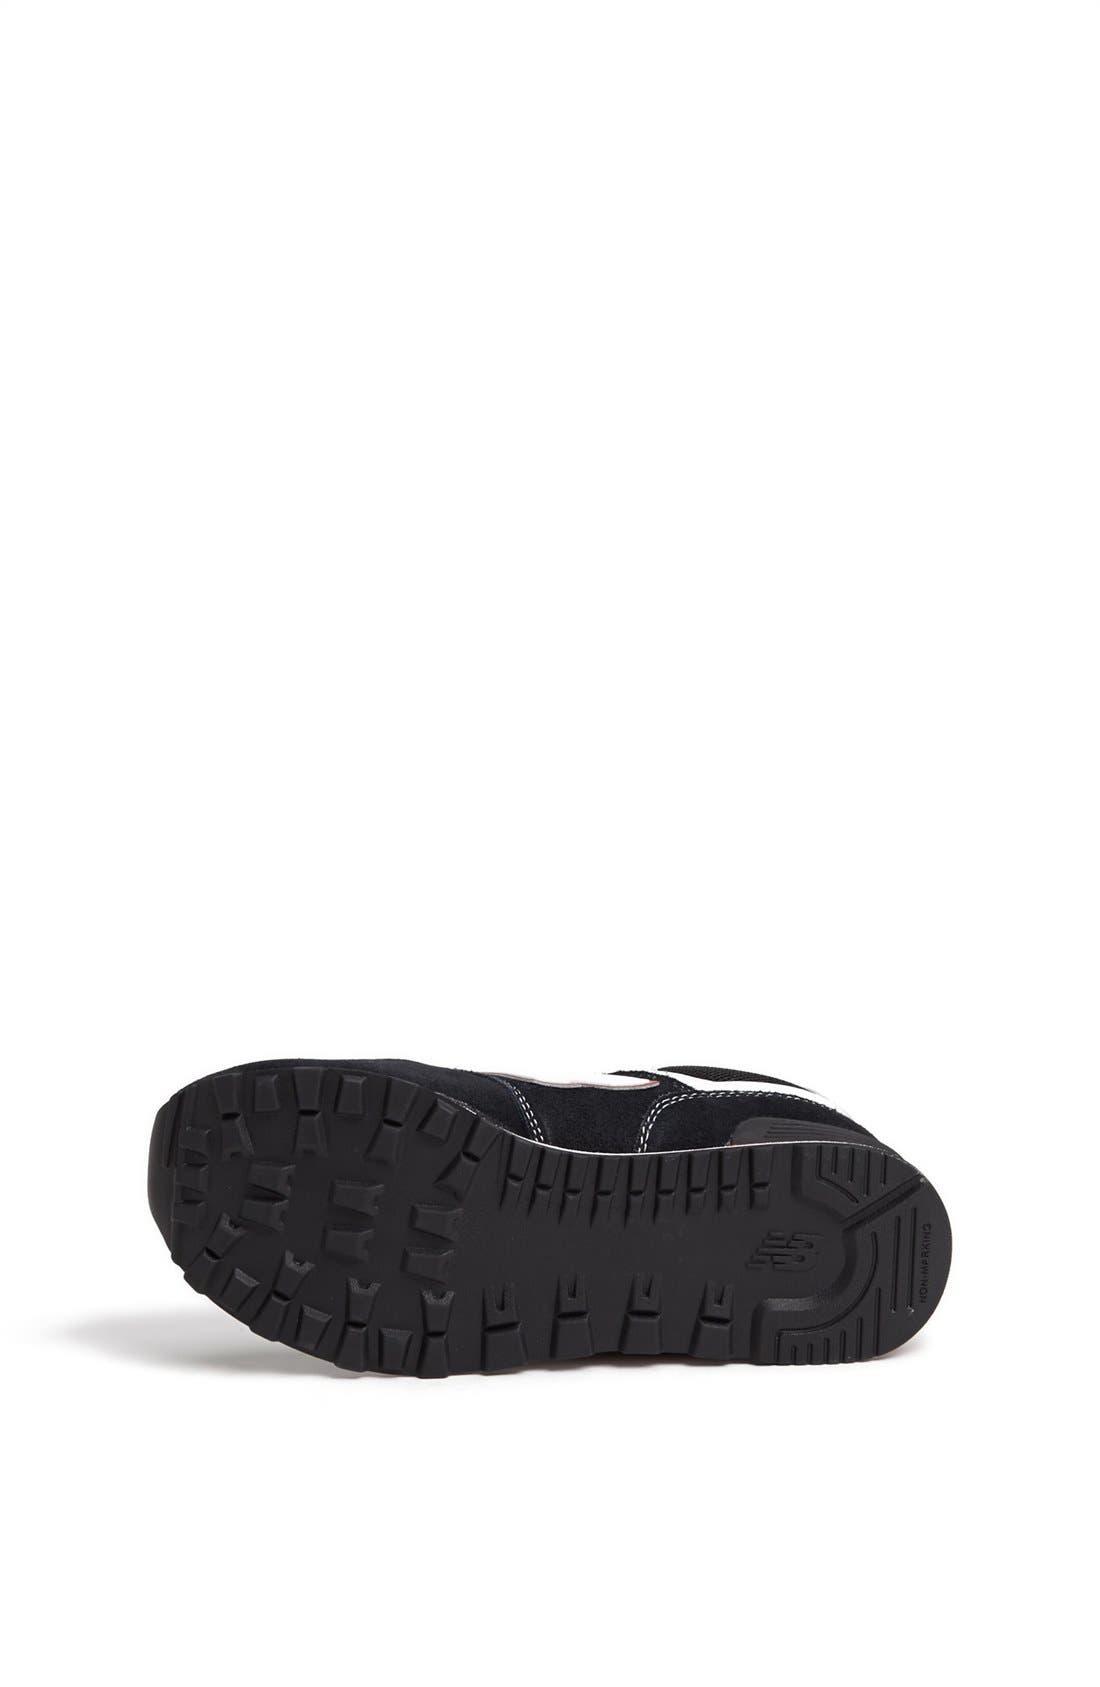 Alternate Image 4  - New Balance '574 Classic' Sneaker (Baby, Walker, Toddler, Little Kid & Big Kid)